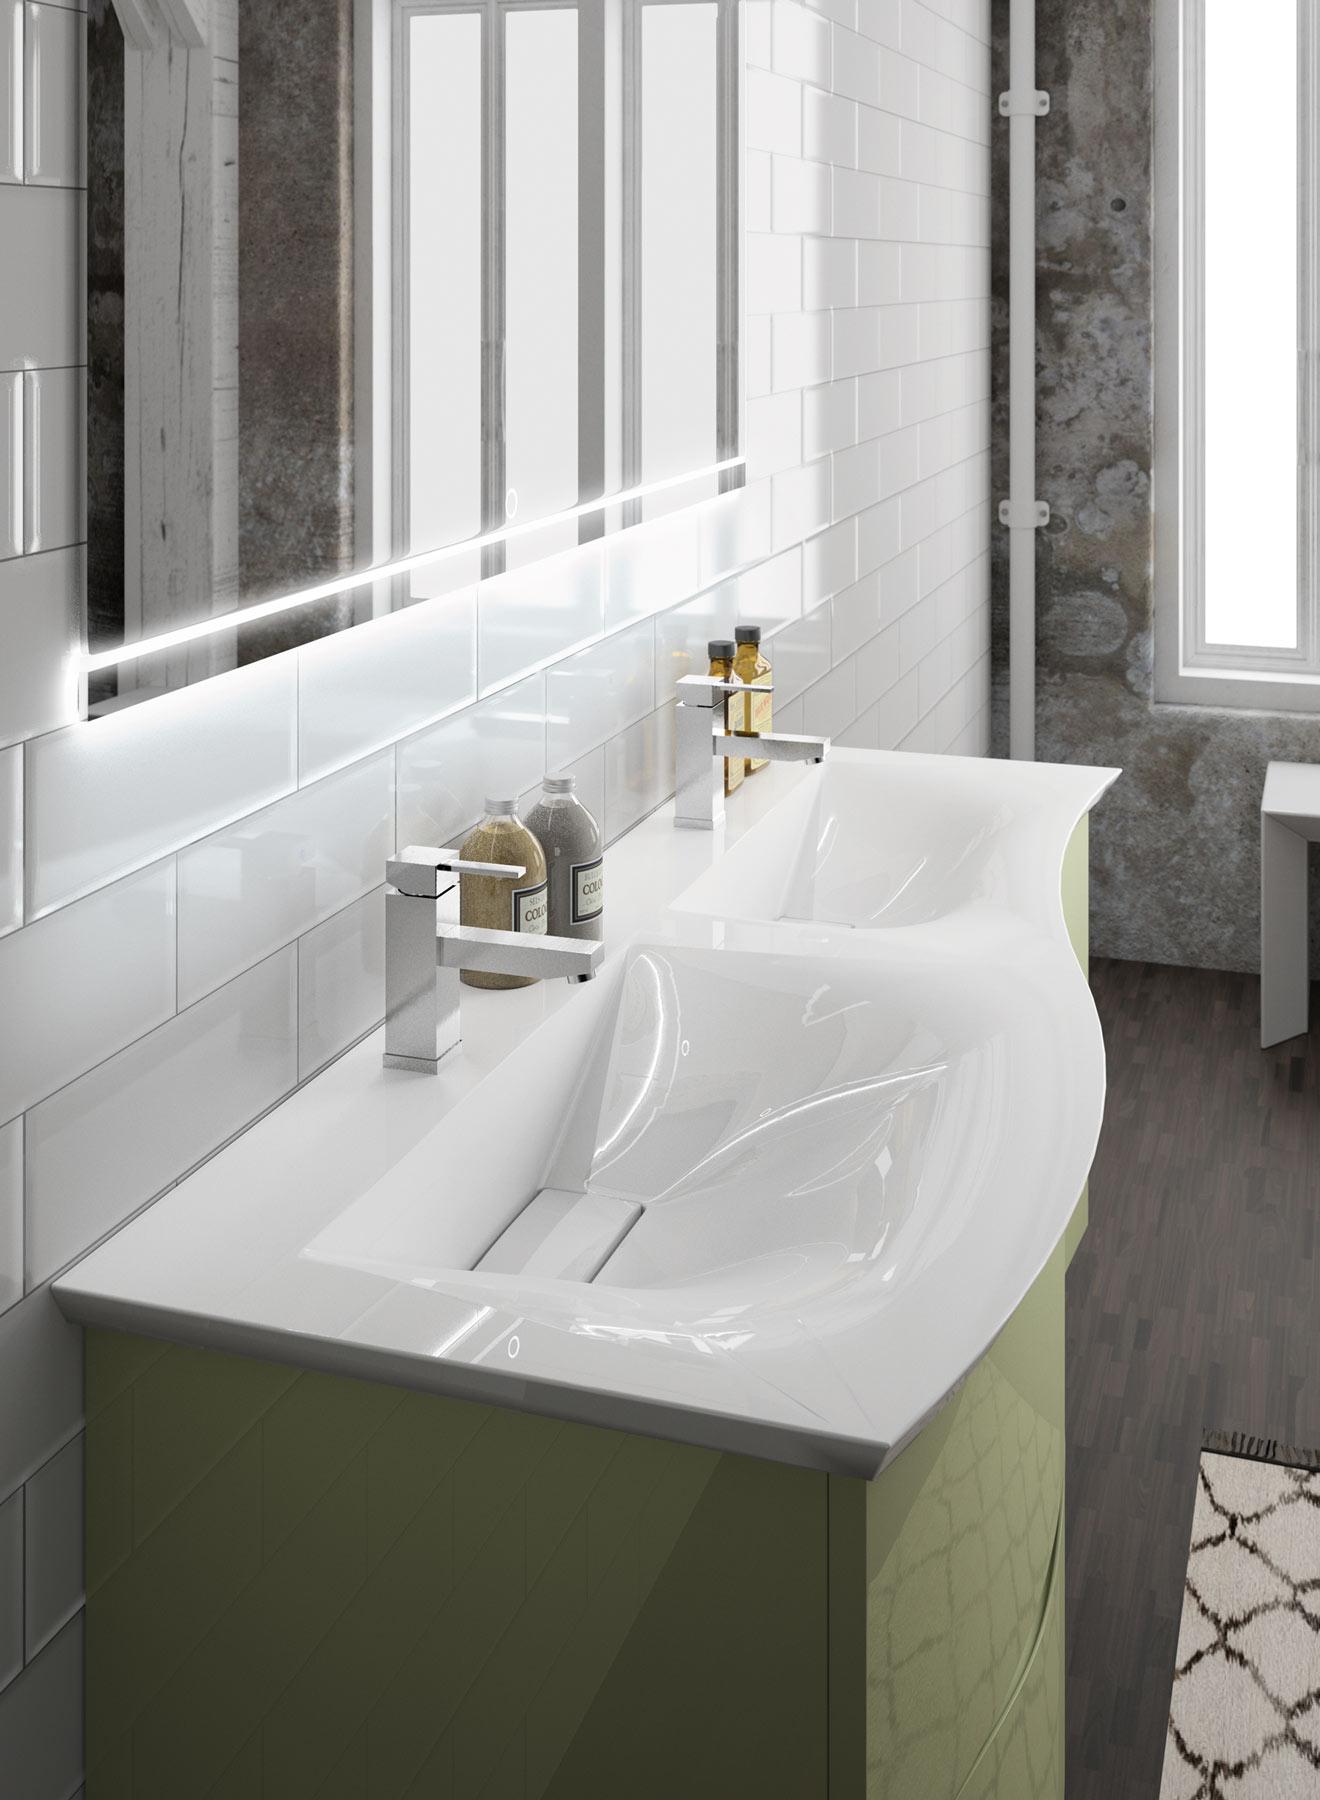 Curl meubles de salle de bains baignoires fabricant - Fabricant meuble de salle de bain ...